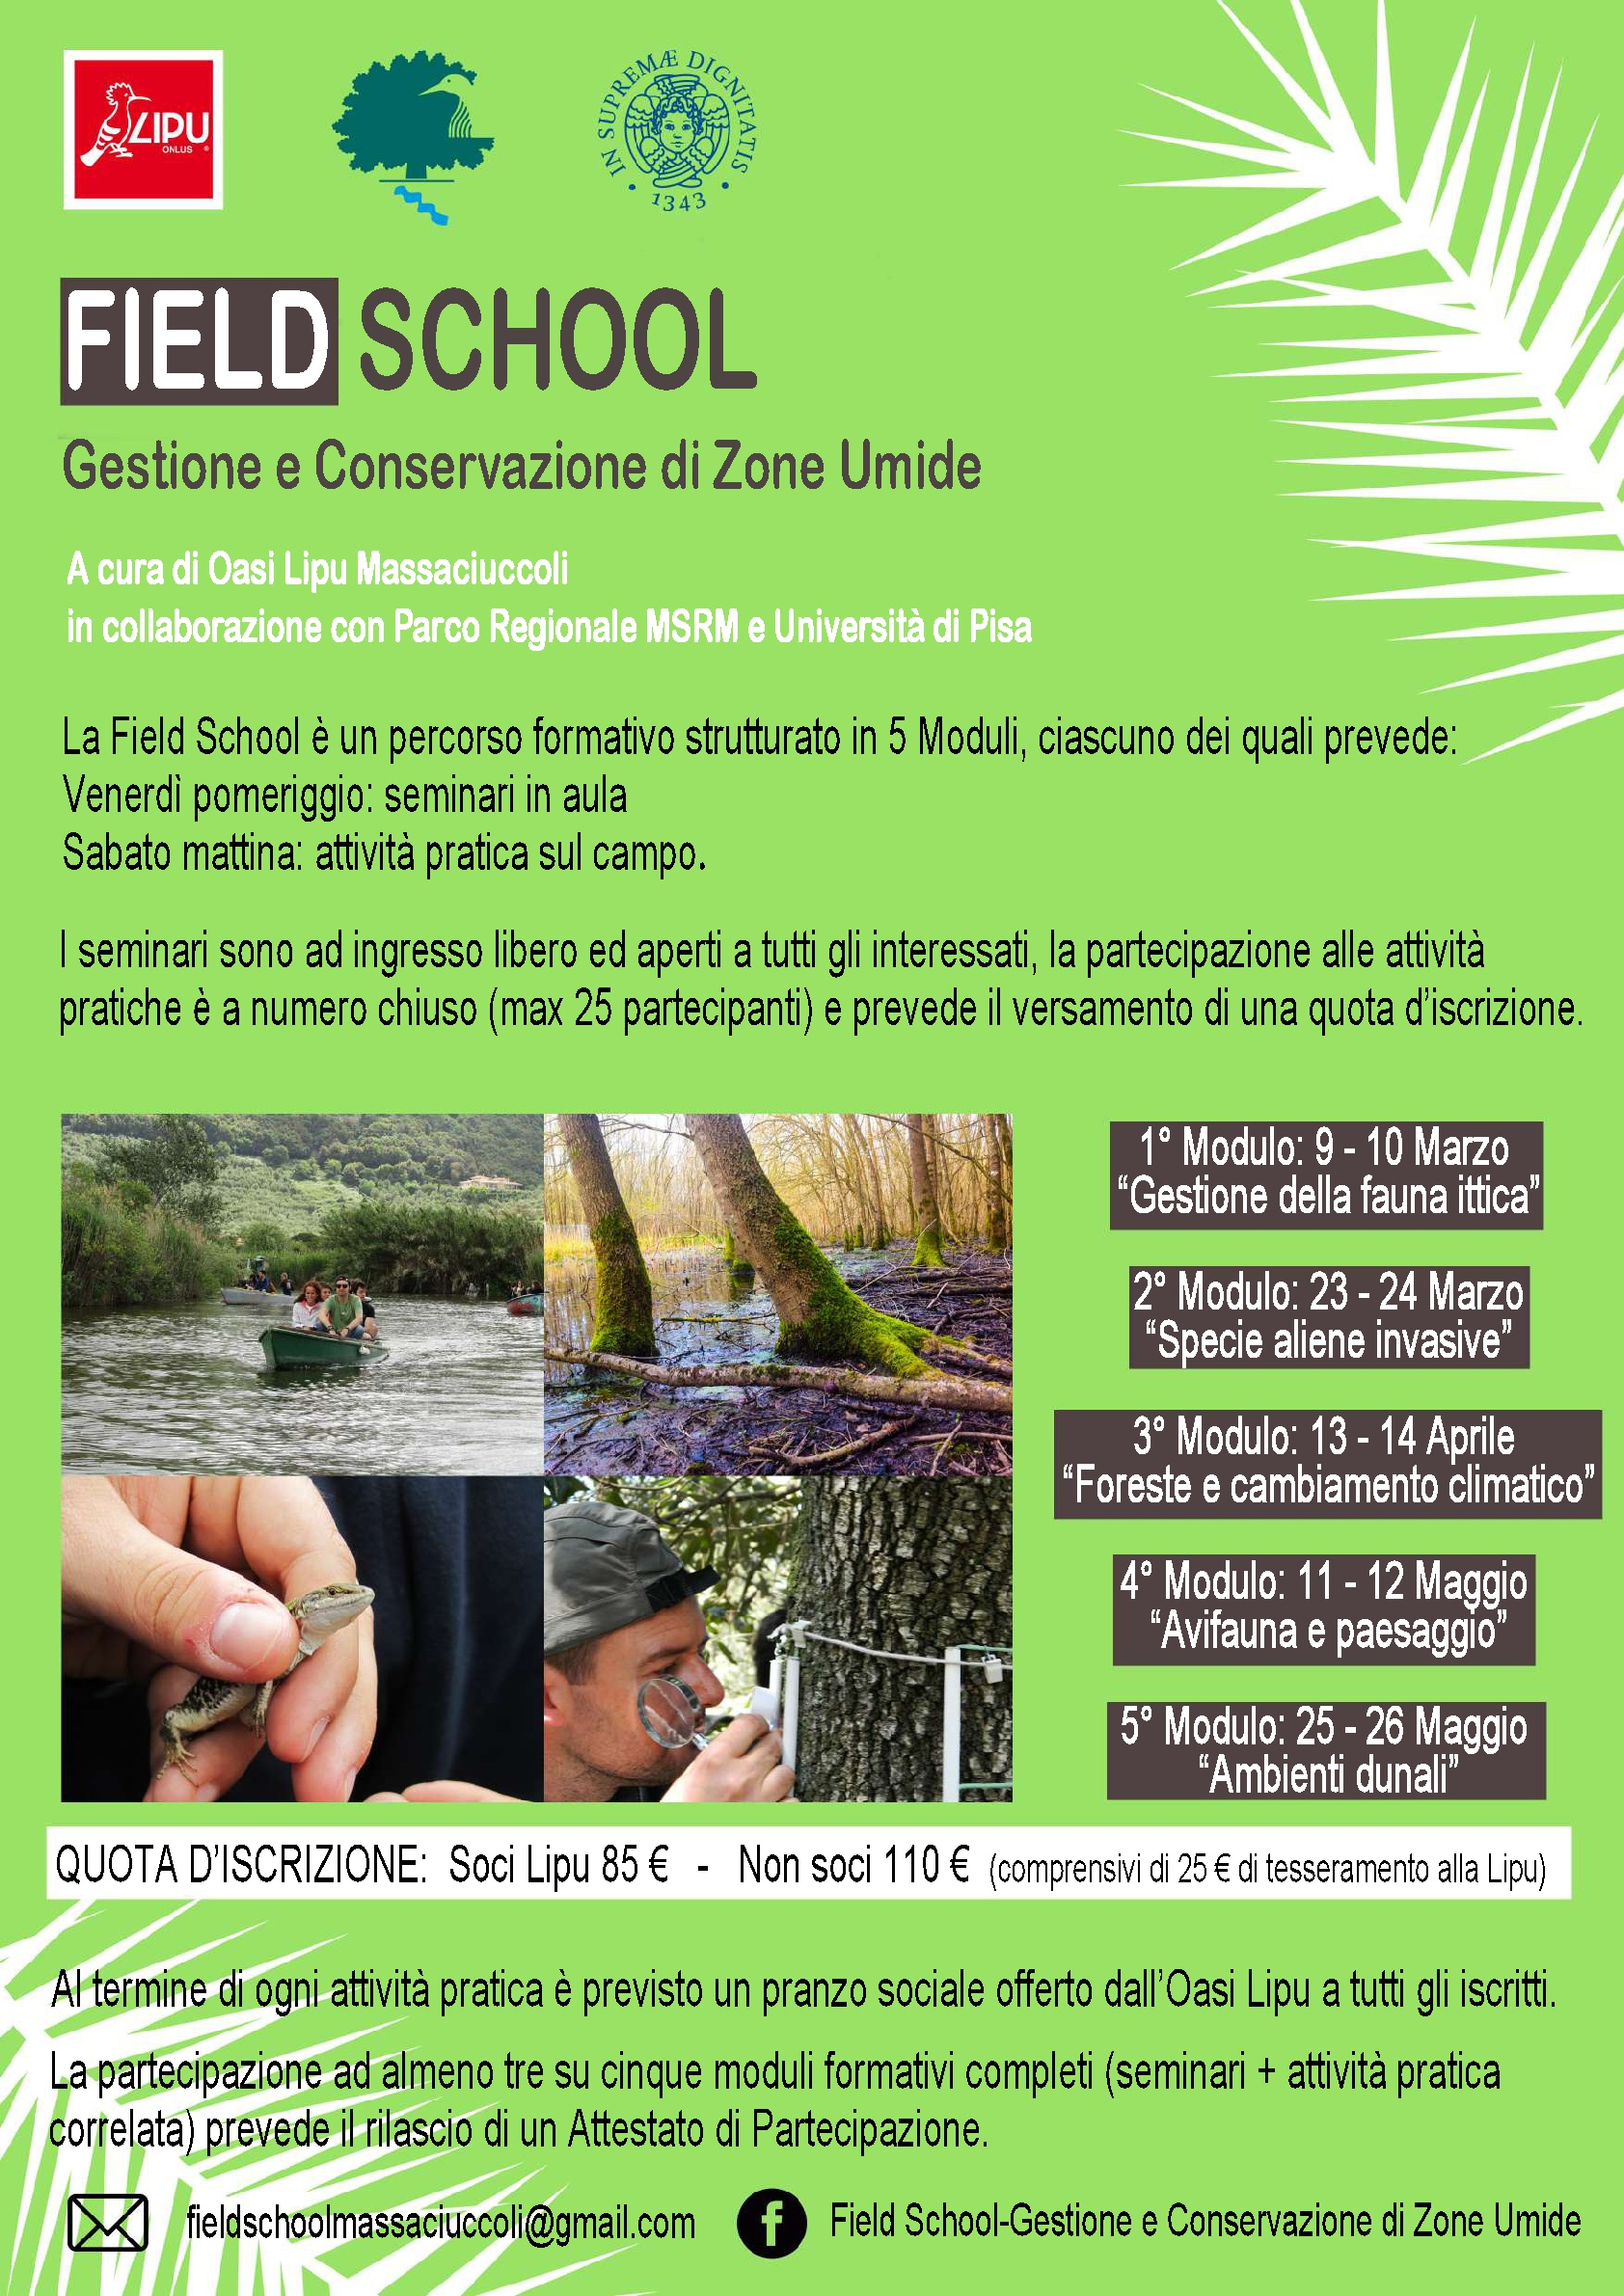 Locandina-fieldschool-2018-001